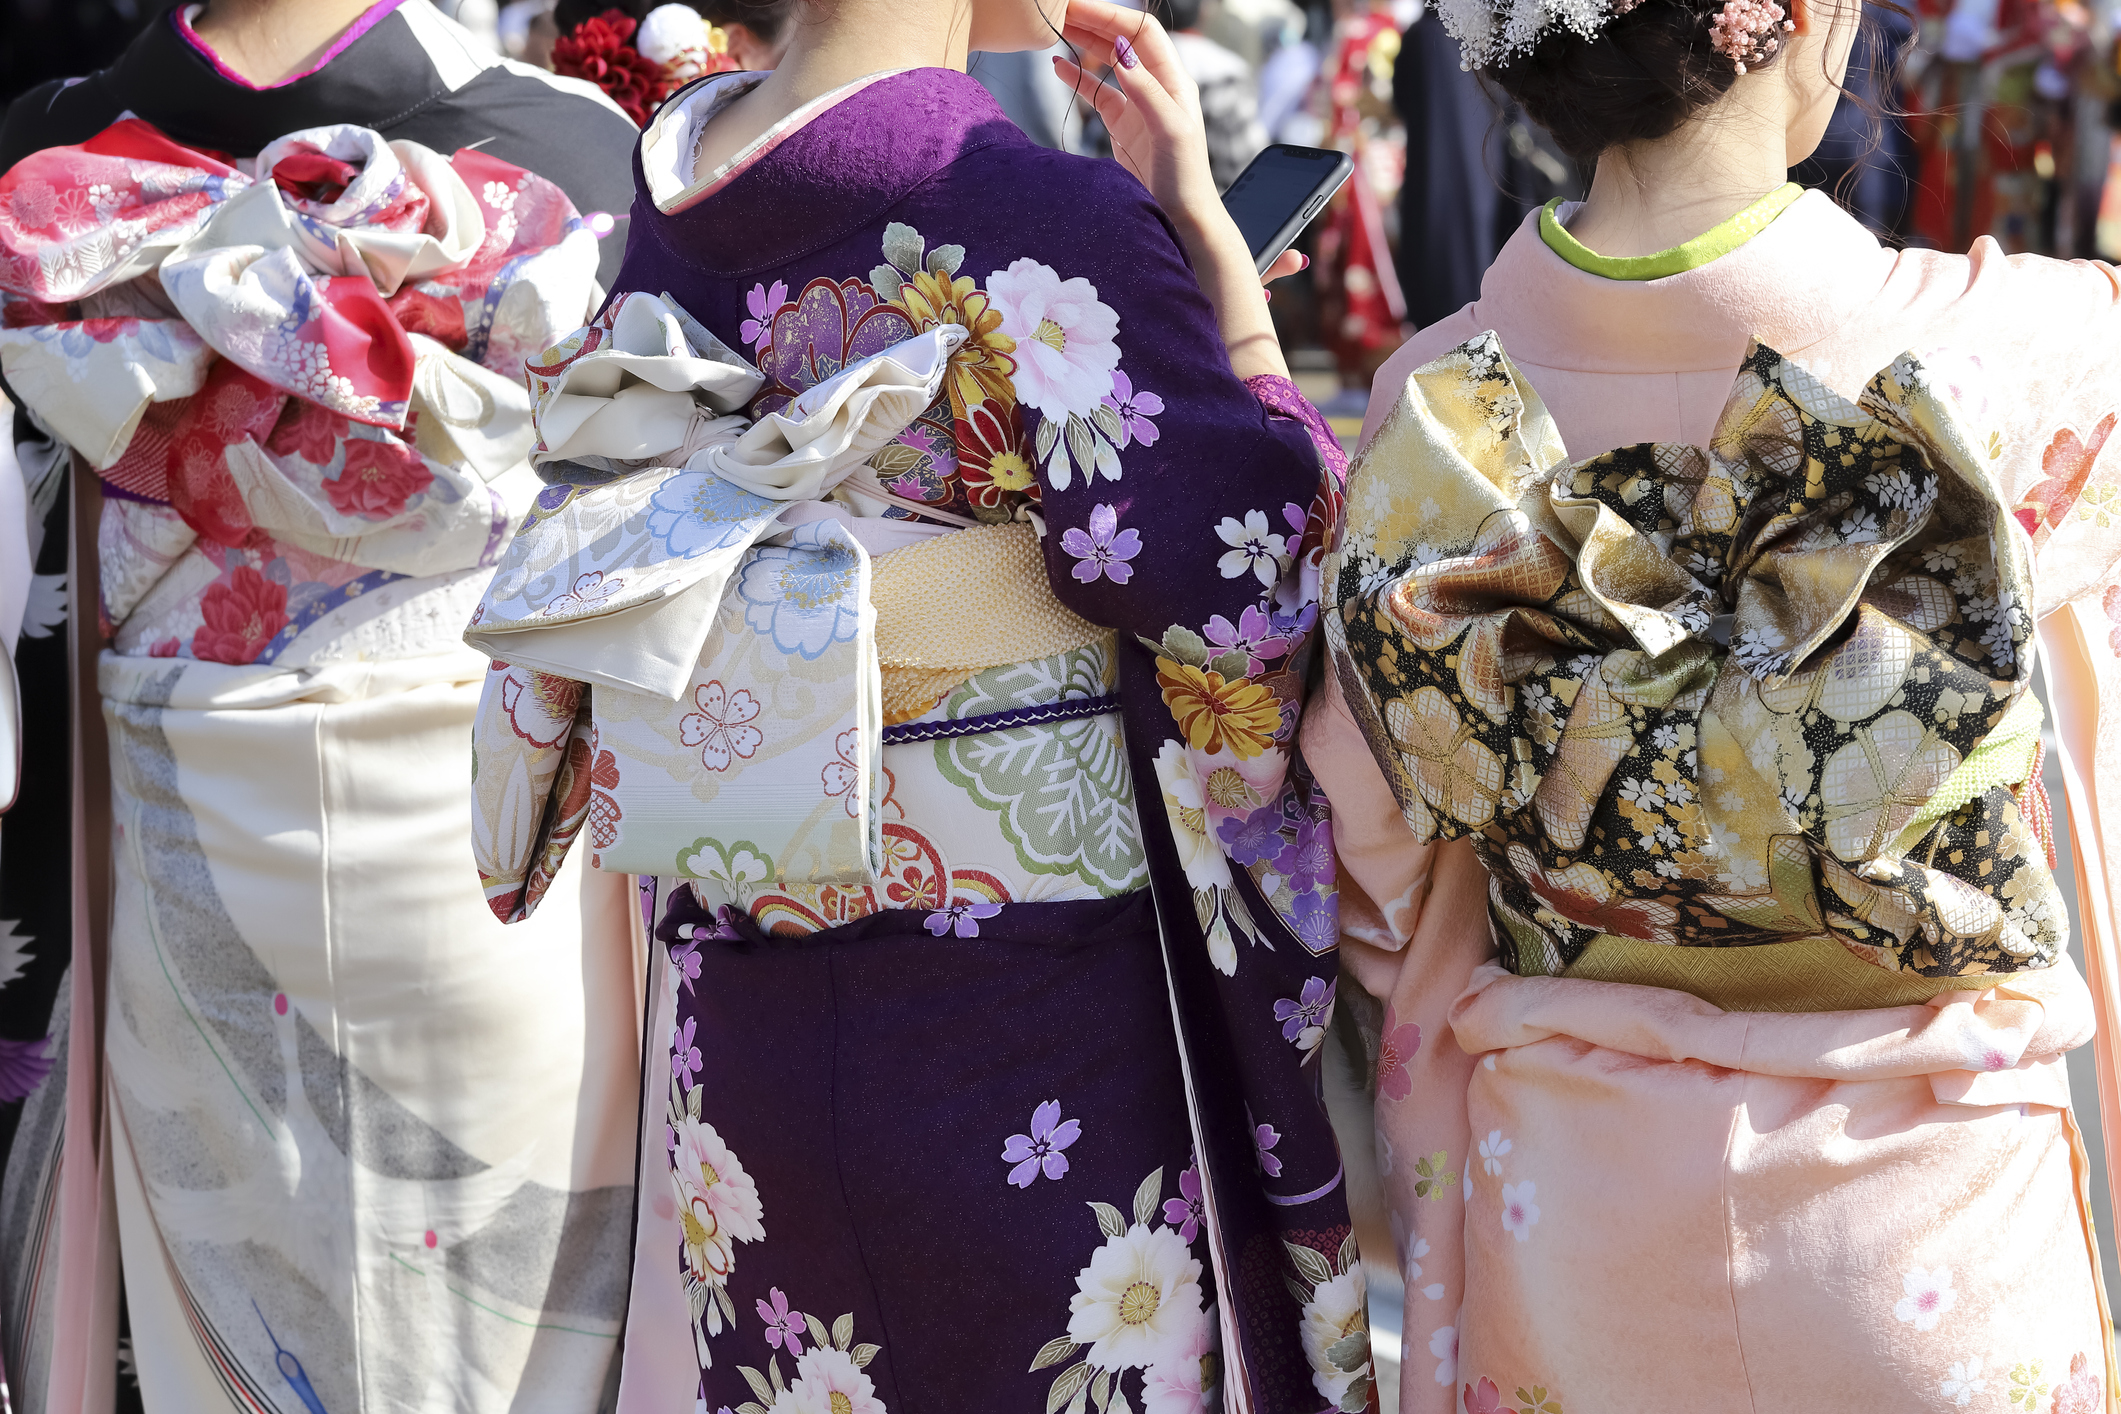 Kimono Fashion With A Twist - Close-up on obi